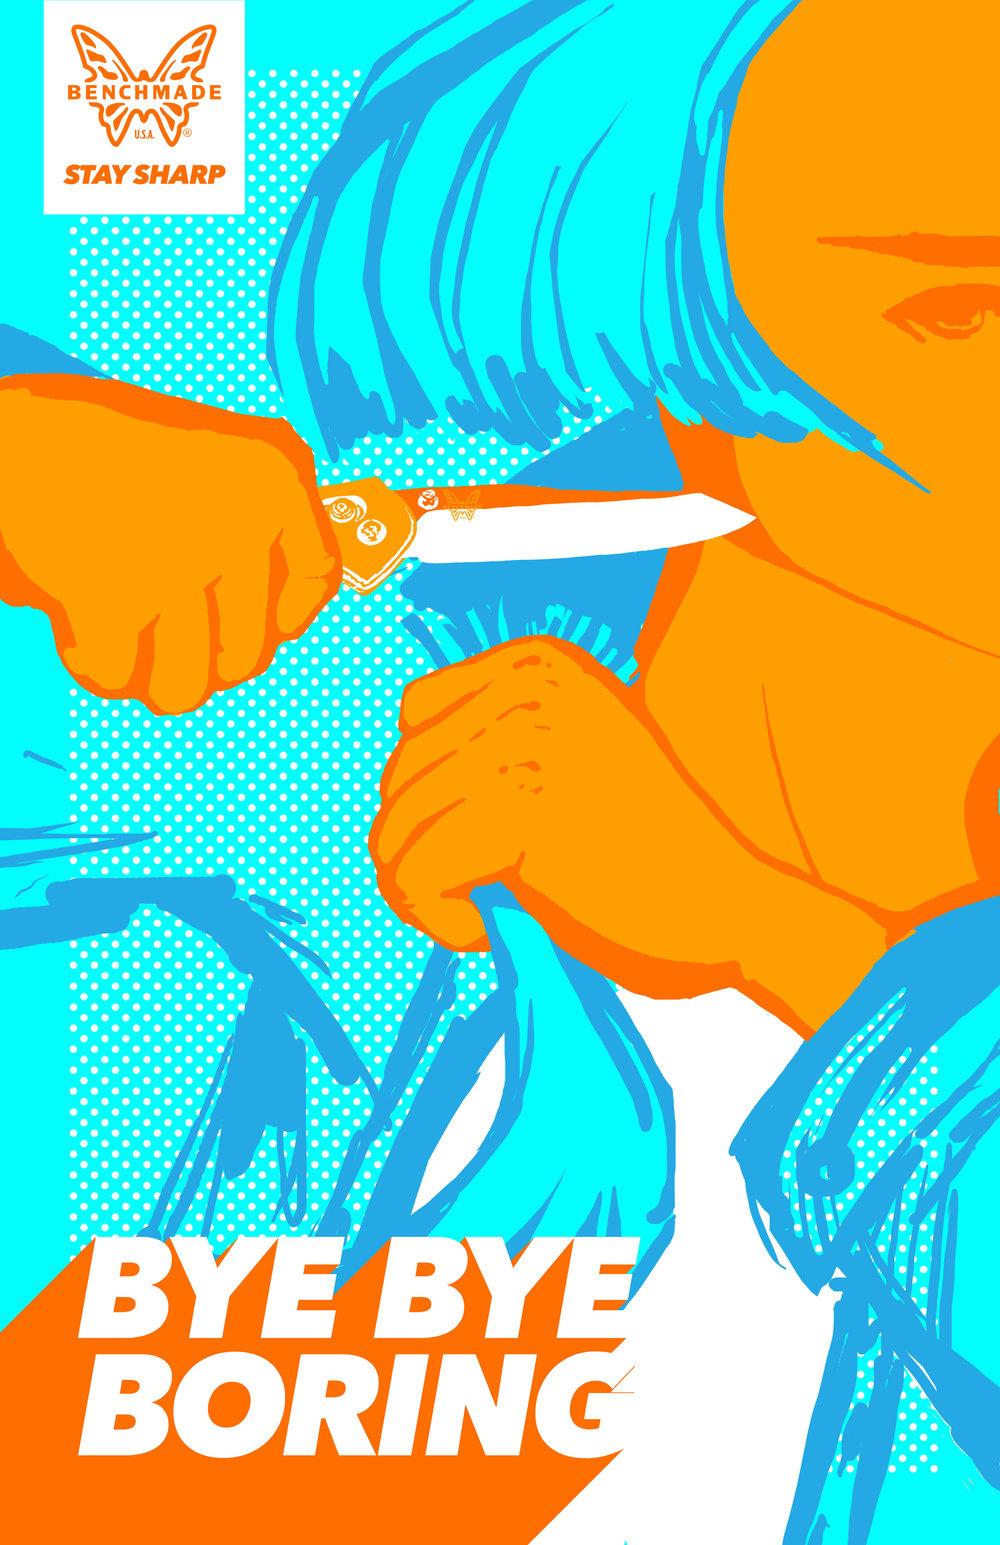 Benchmade_Poster2.jpg